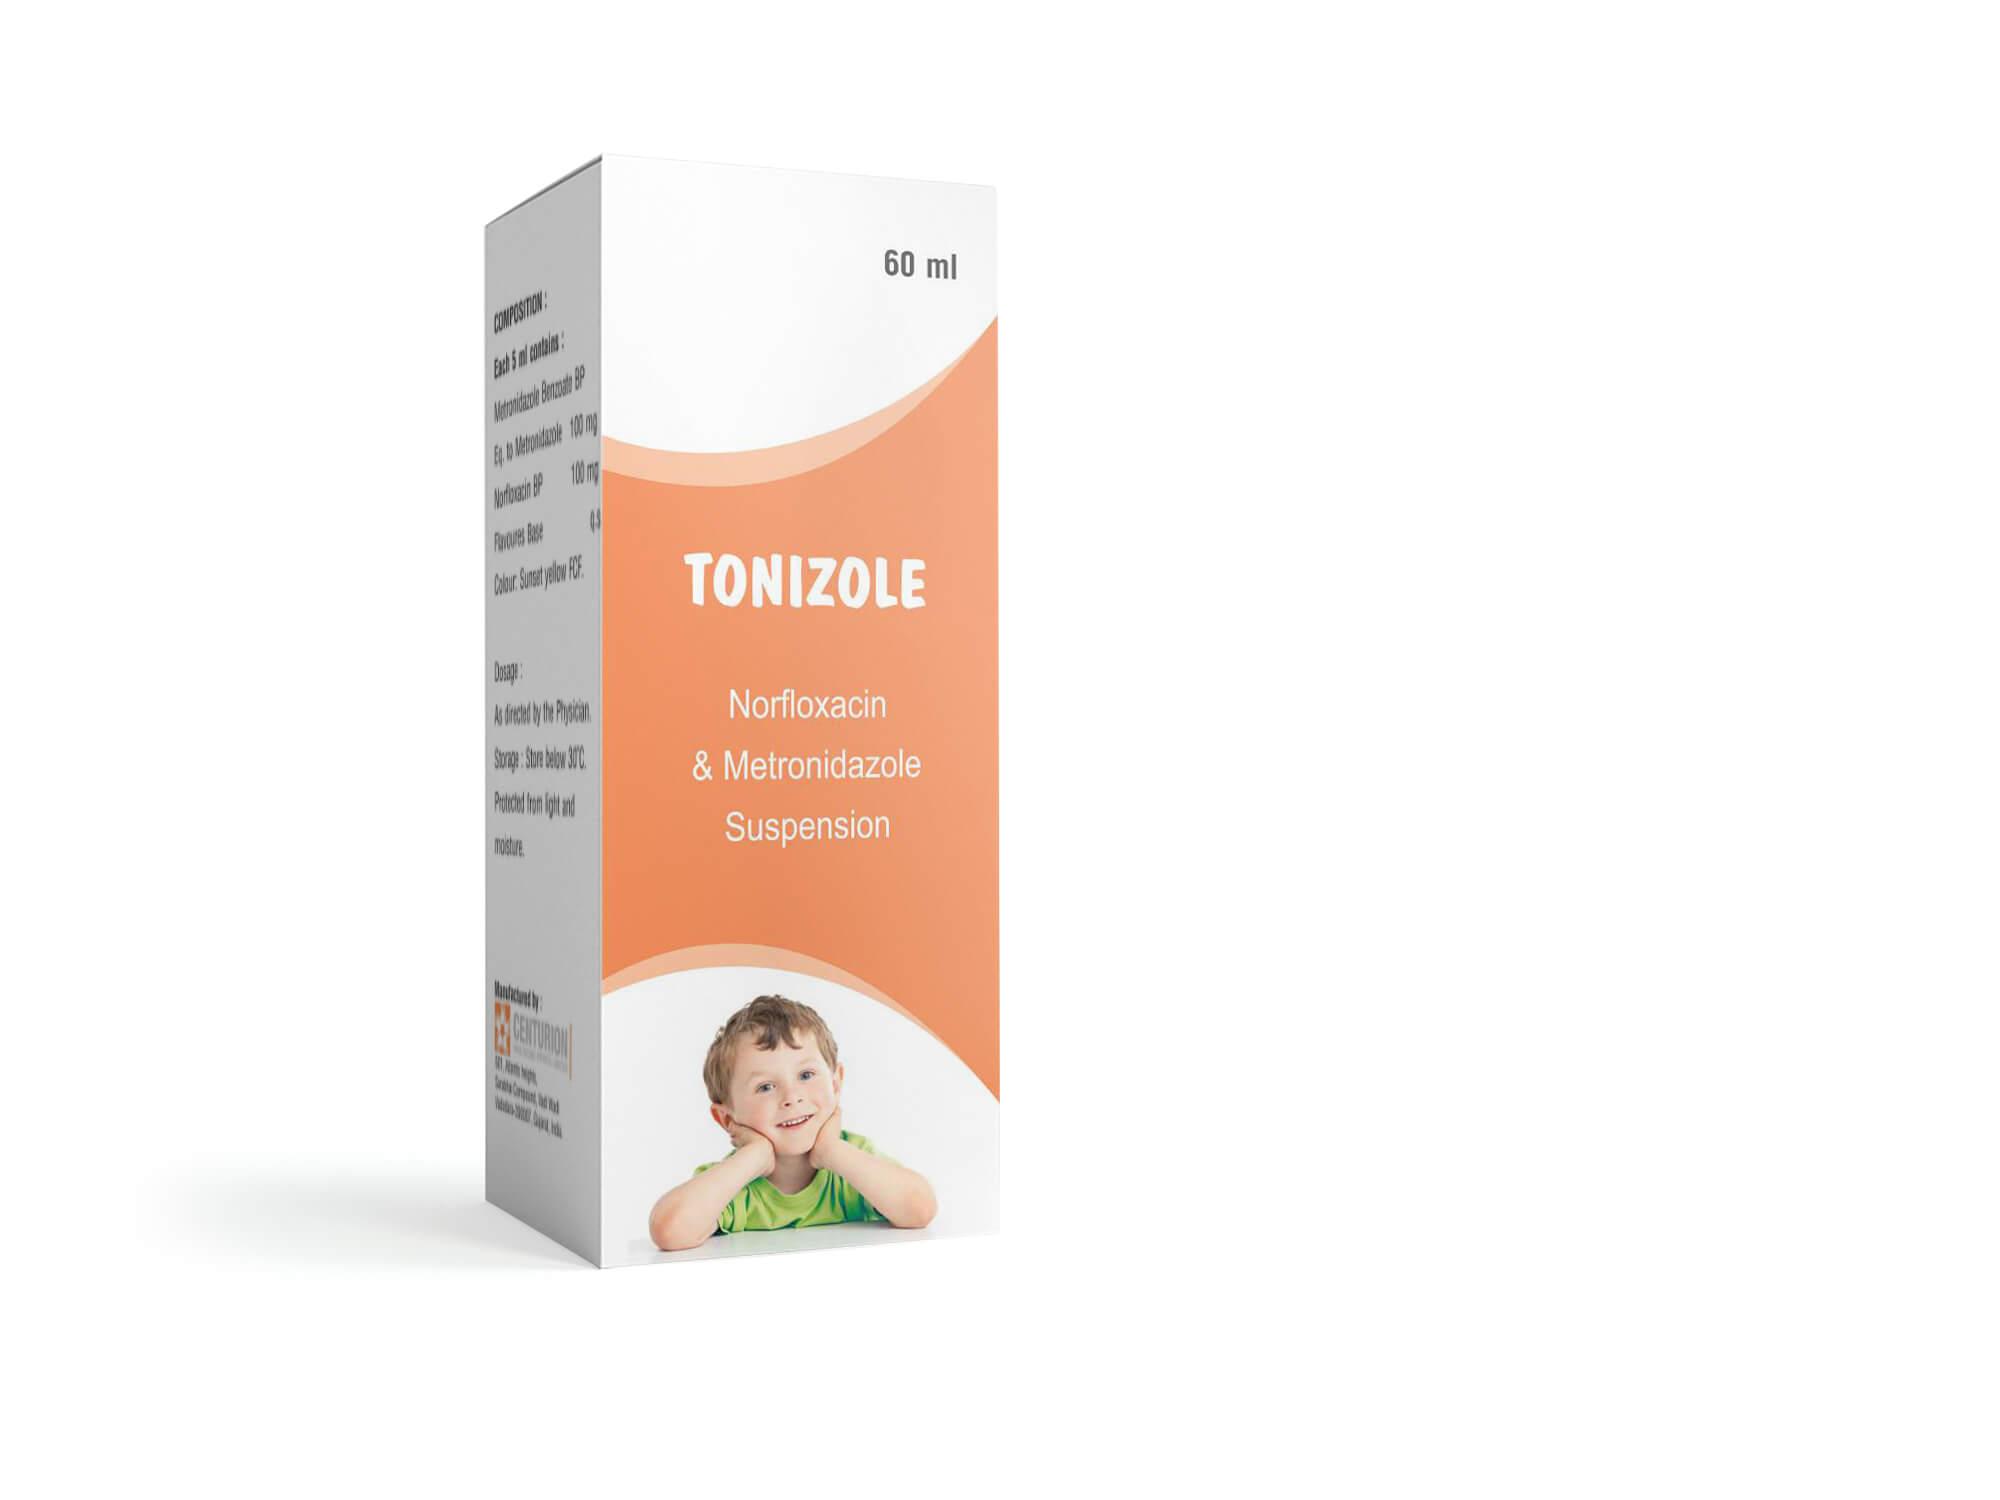 Tonizole Suspension